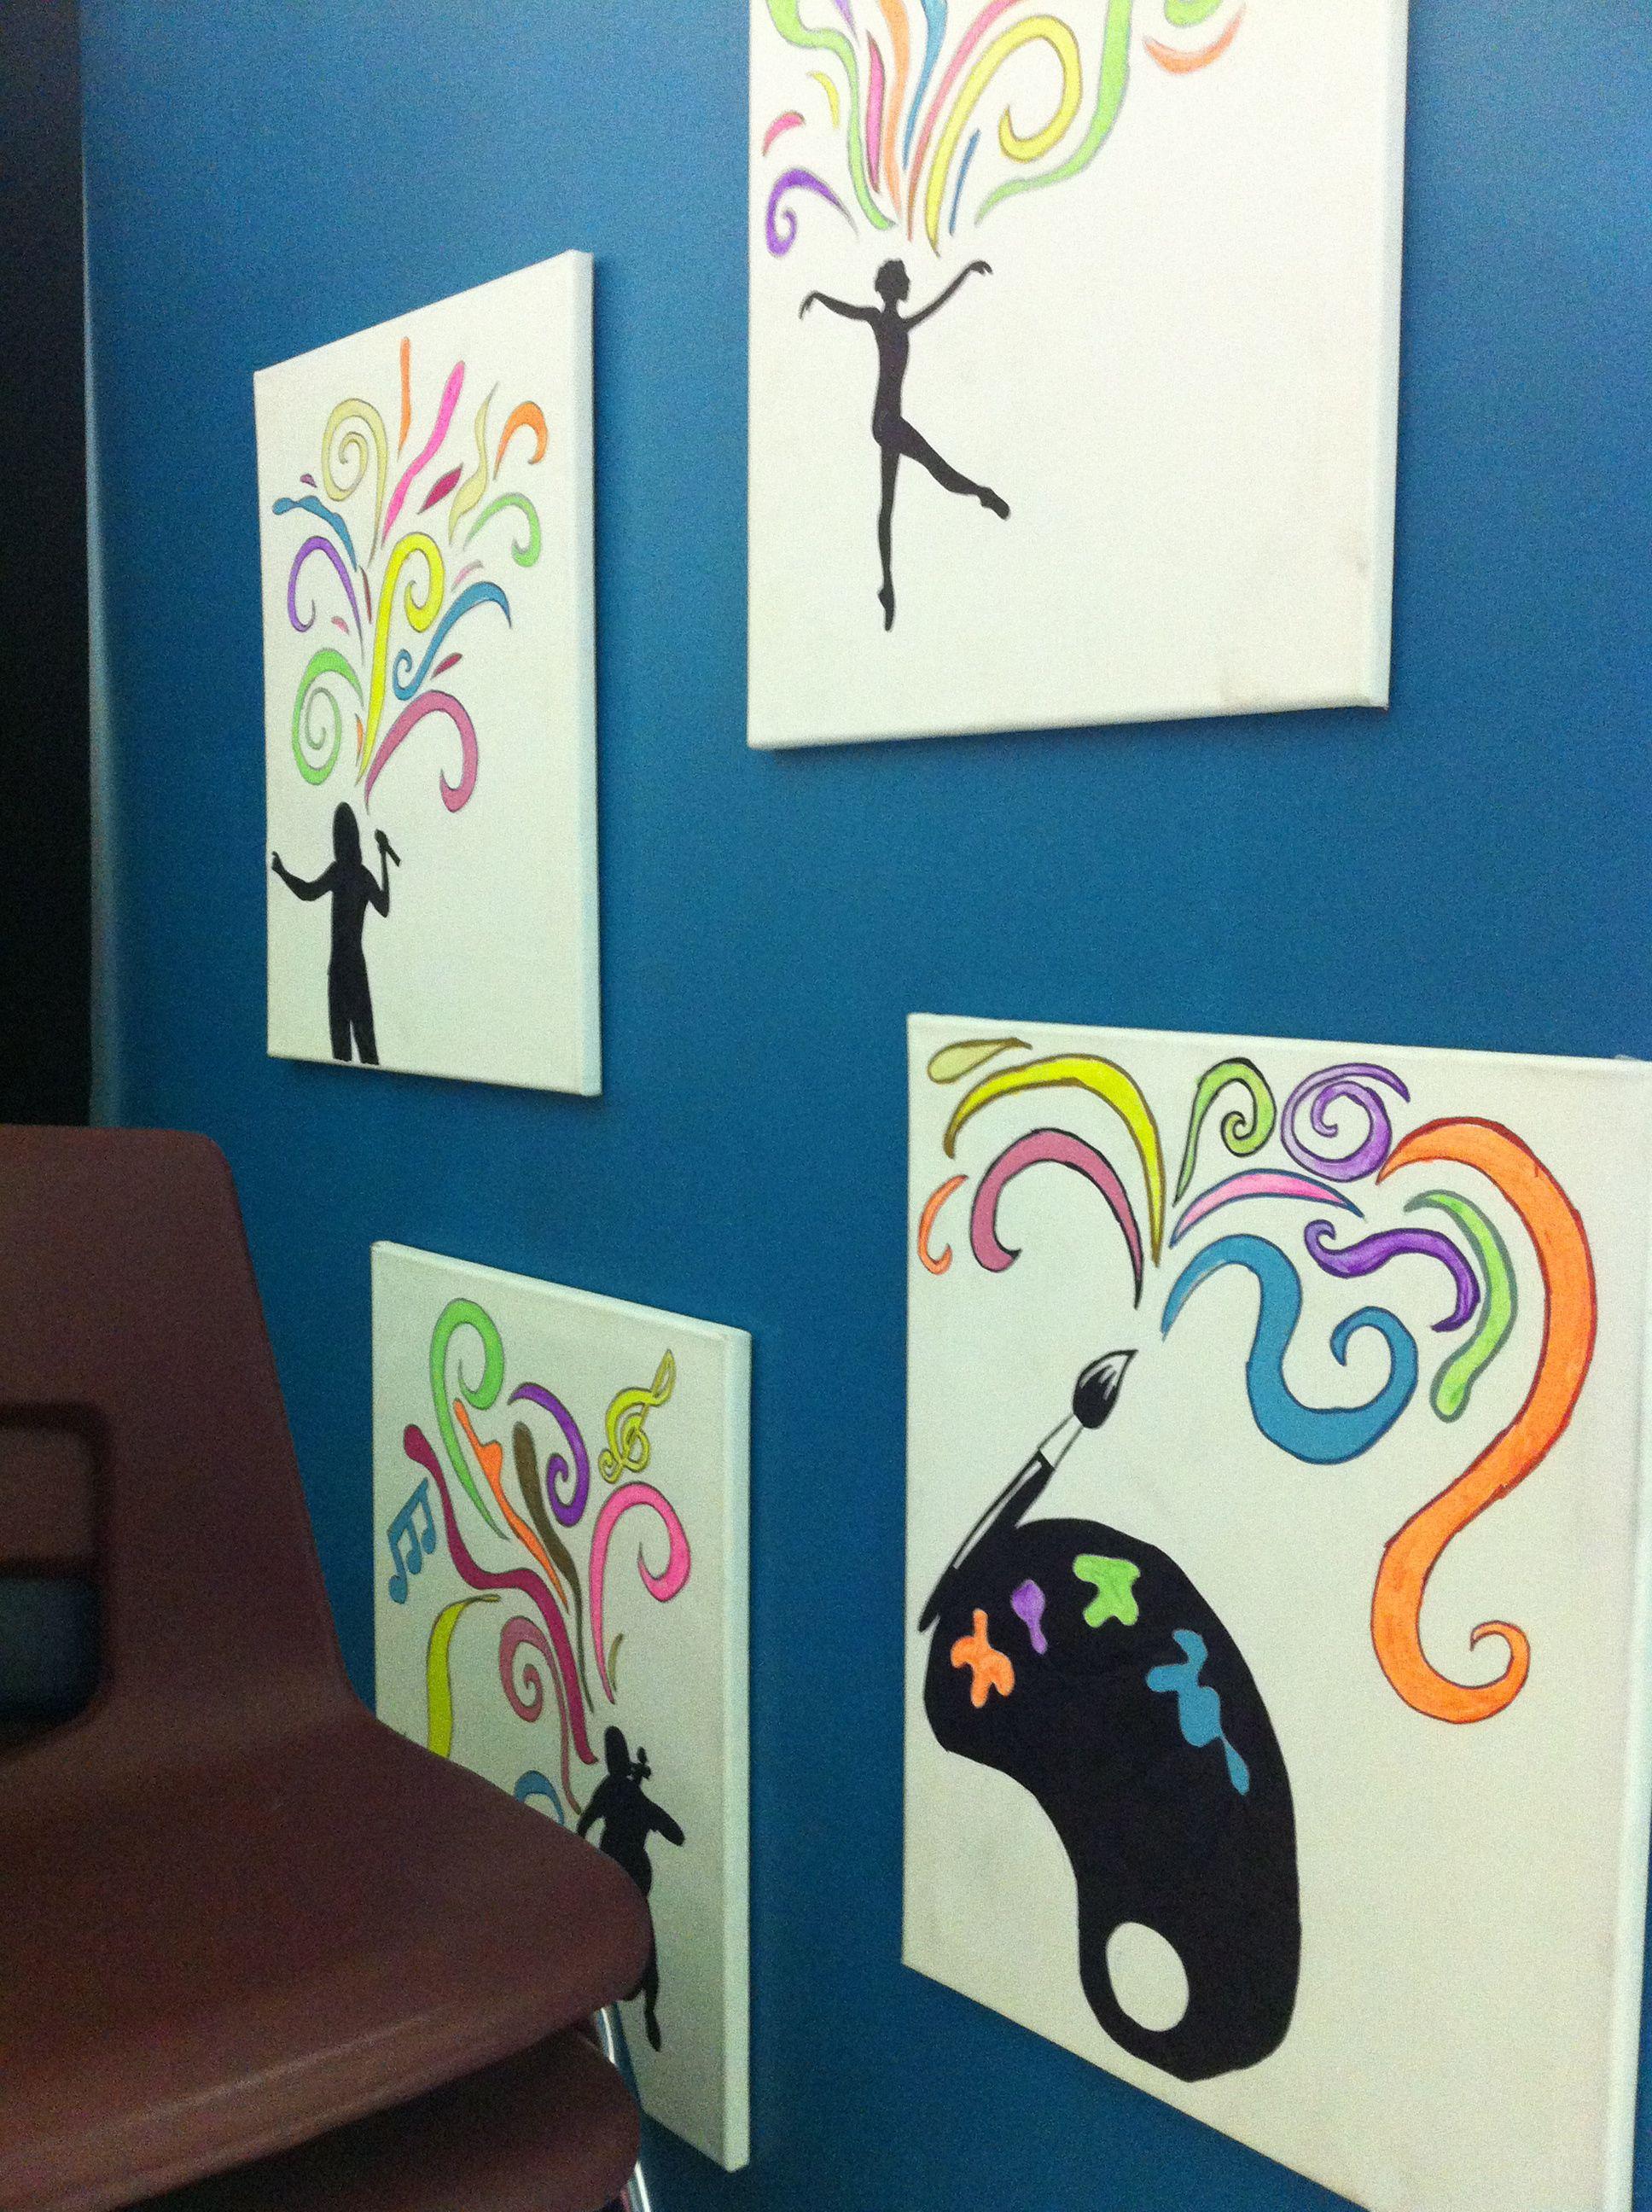 Work Students Created Showcase Arts. Art Show